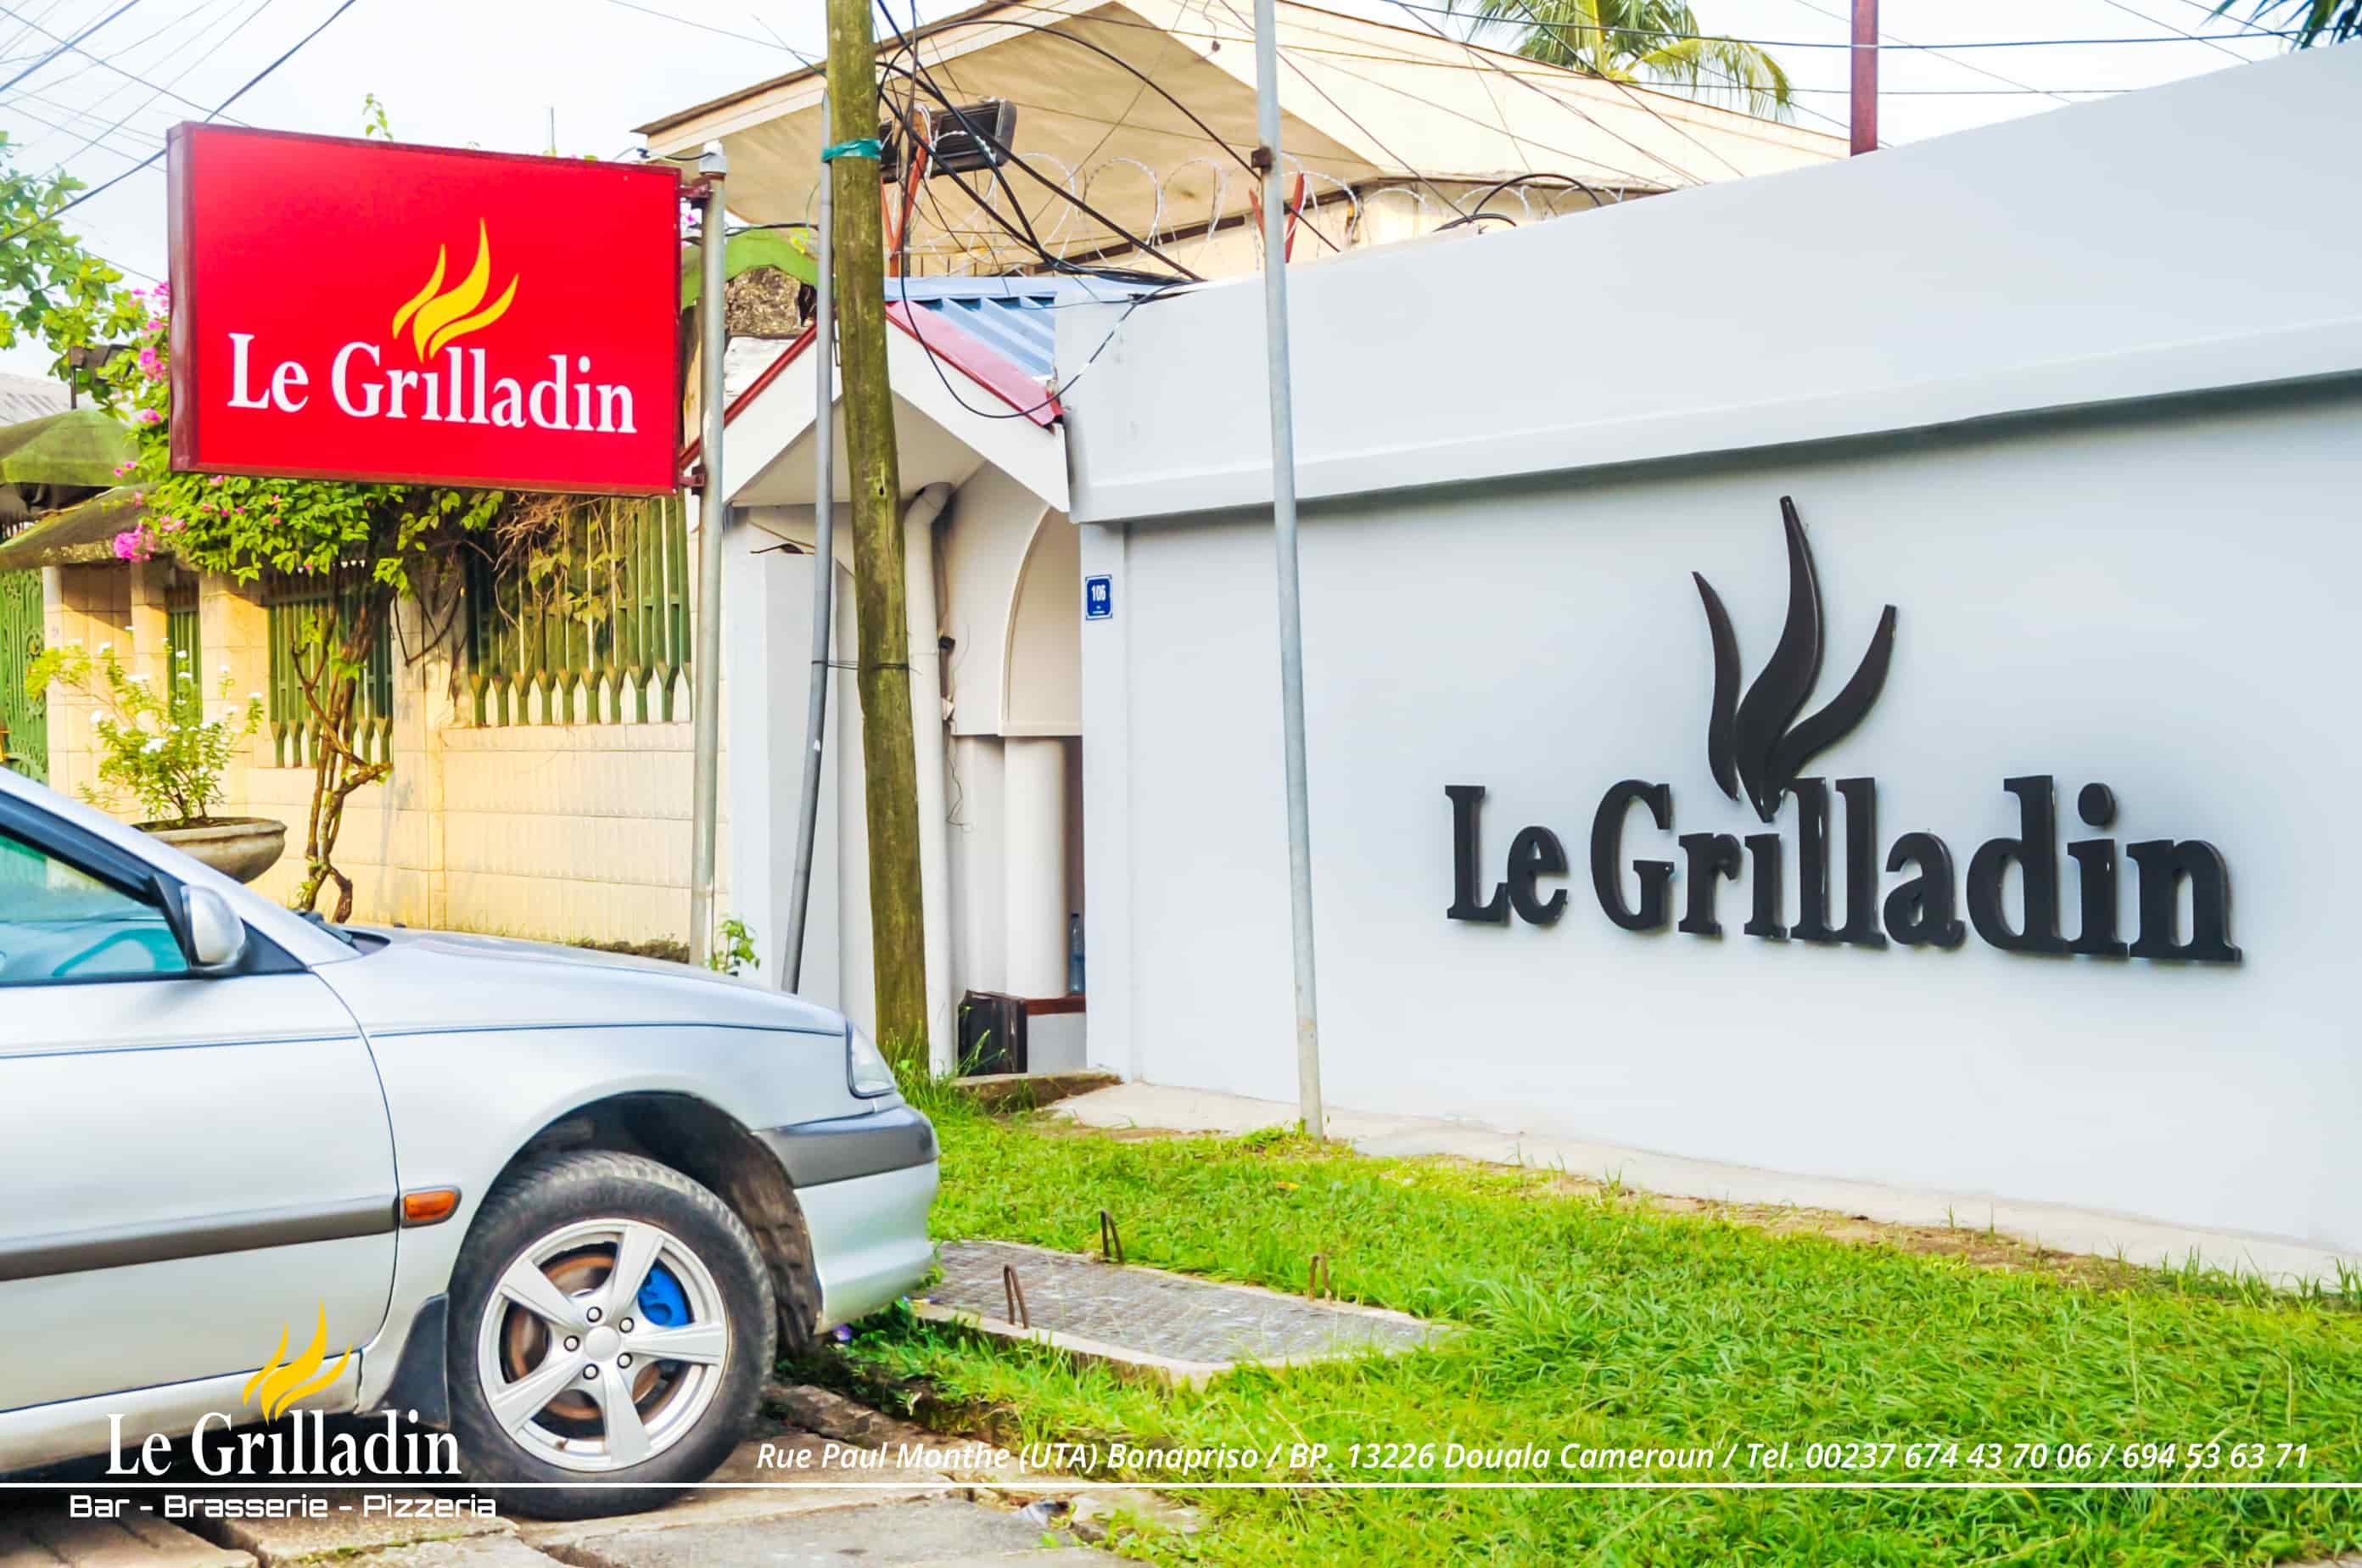 Le Grilladin